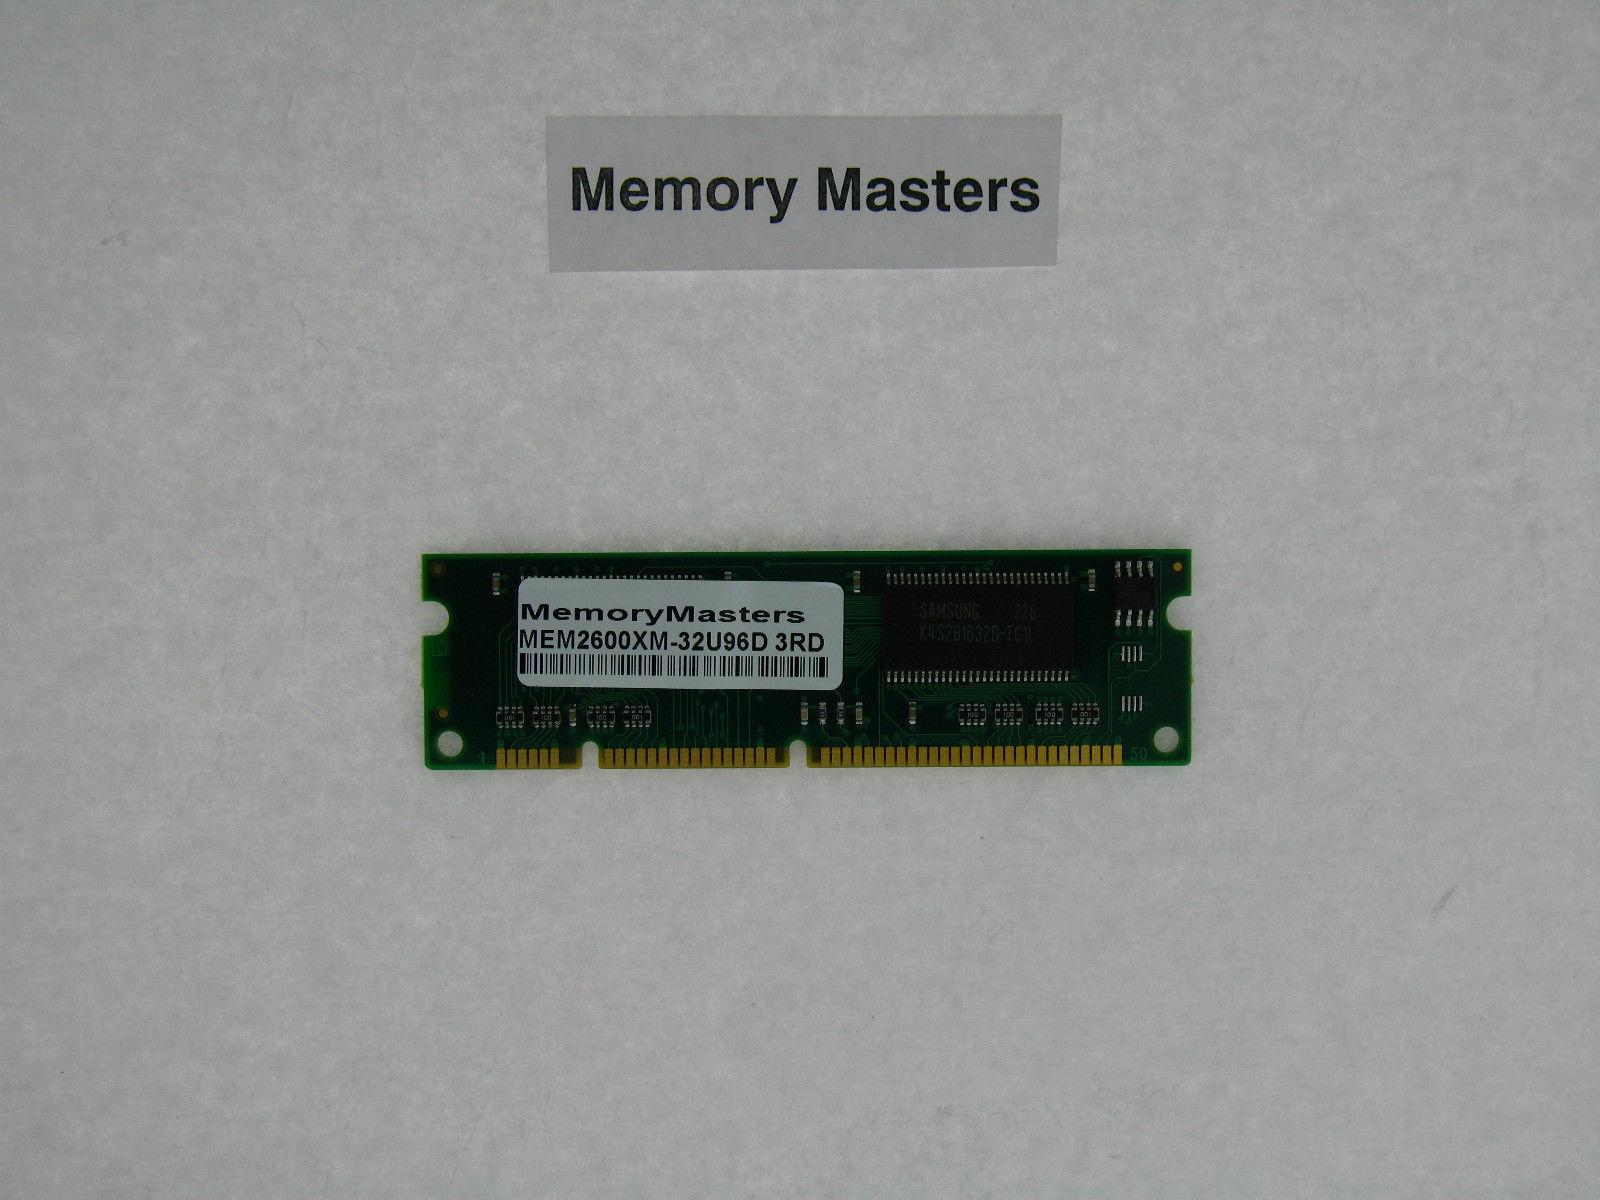 MEM-7301-1GB 1GB 2x512MB Memory Kit 3rd Party Cisco 7301 Router